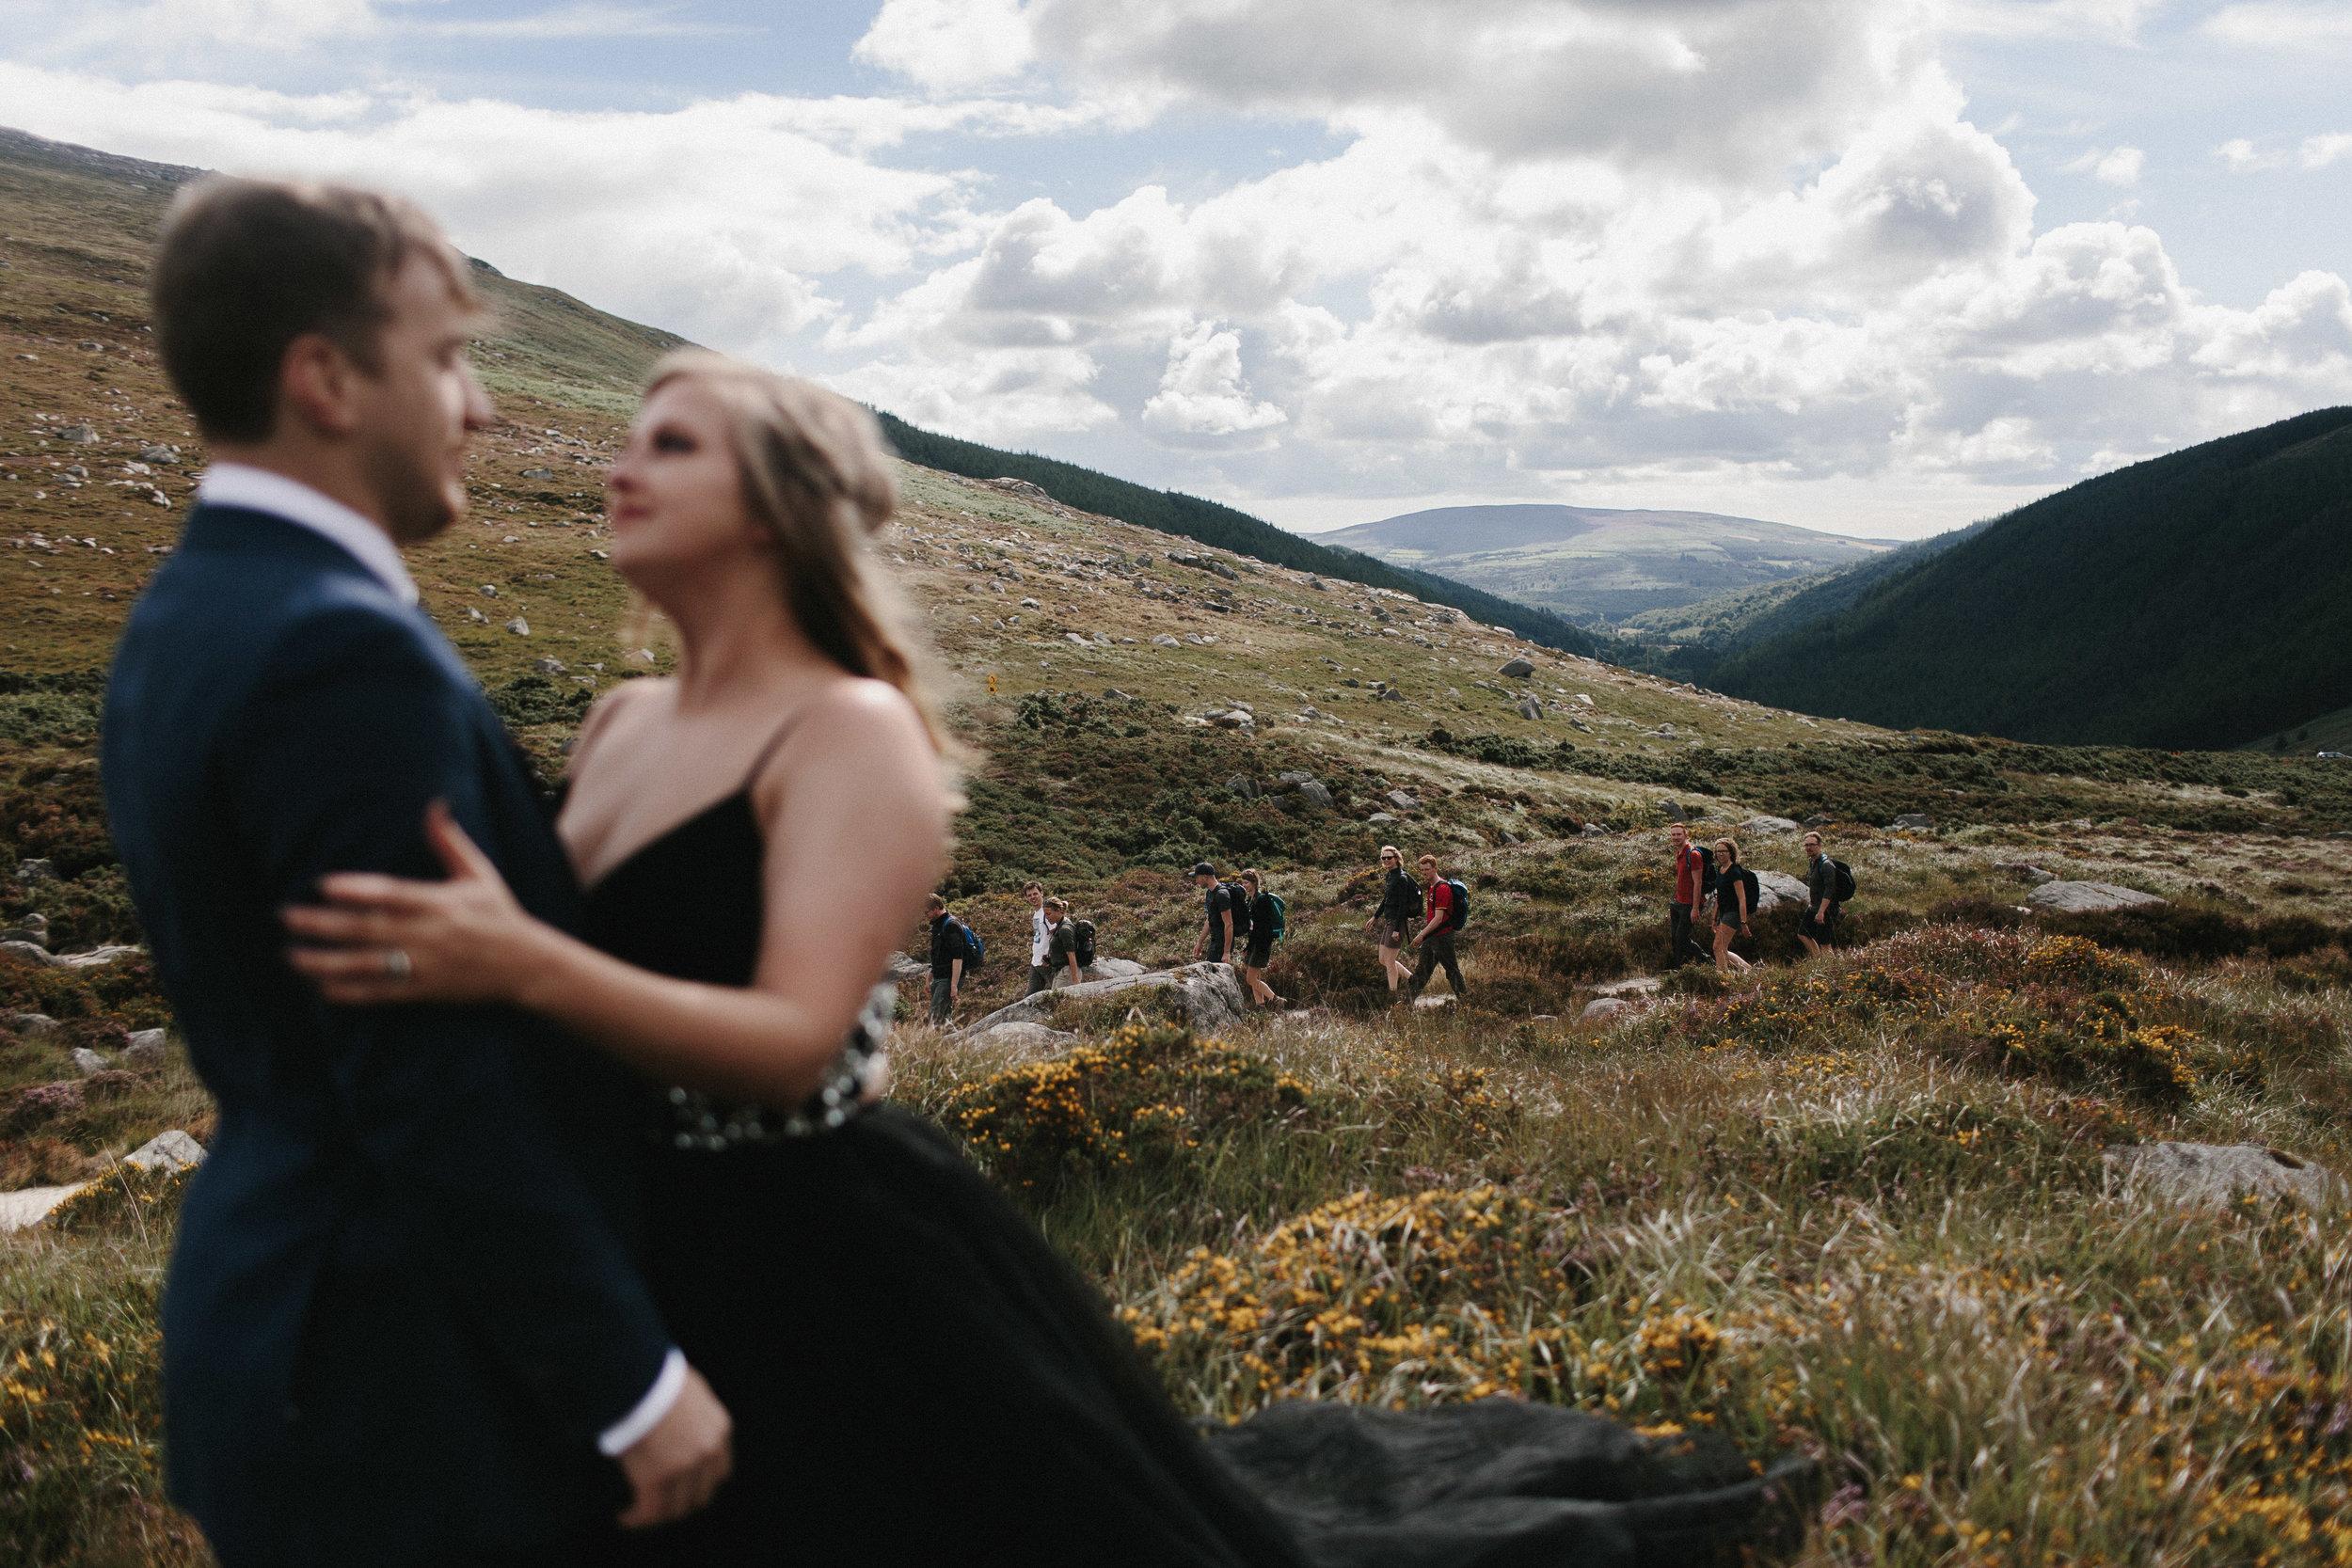 ireland_elopement_black_wedding_dress_wicklow_glendalough_athy_st_kevins_way_1268.jpg